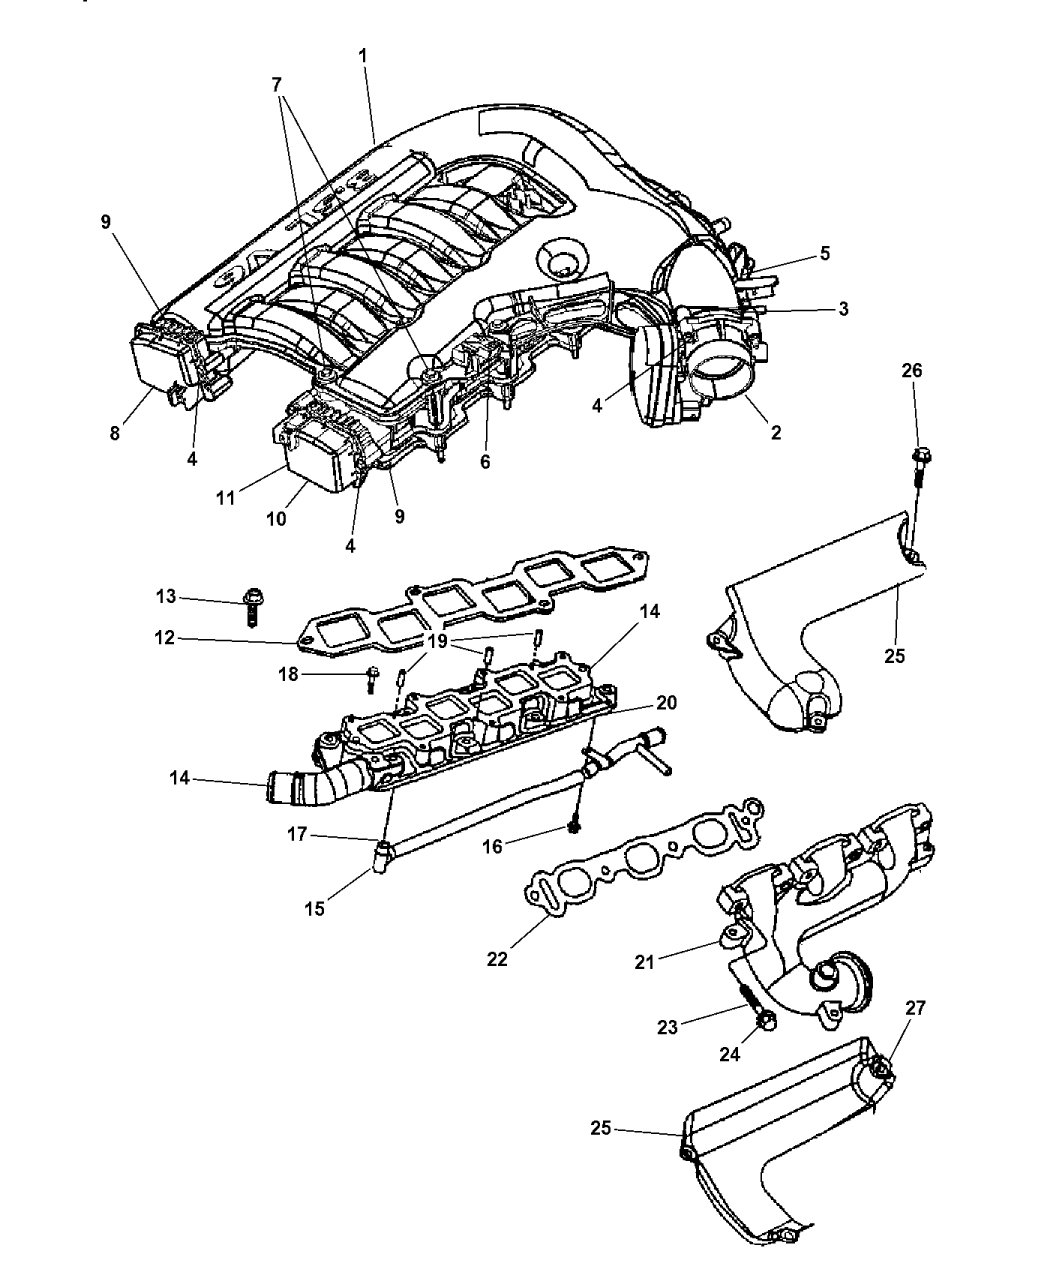 4591863aj Genuine Chrysler Plenum Intake Manifold